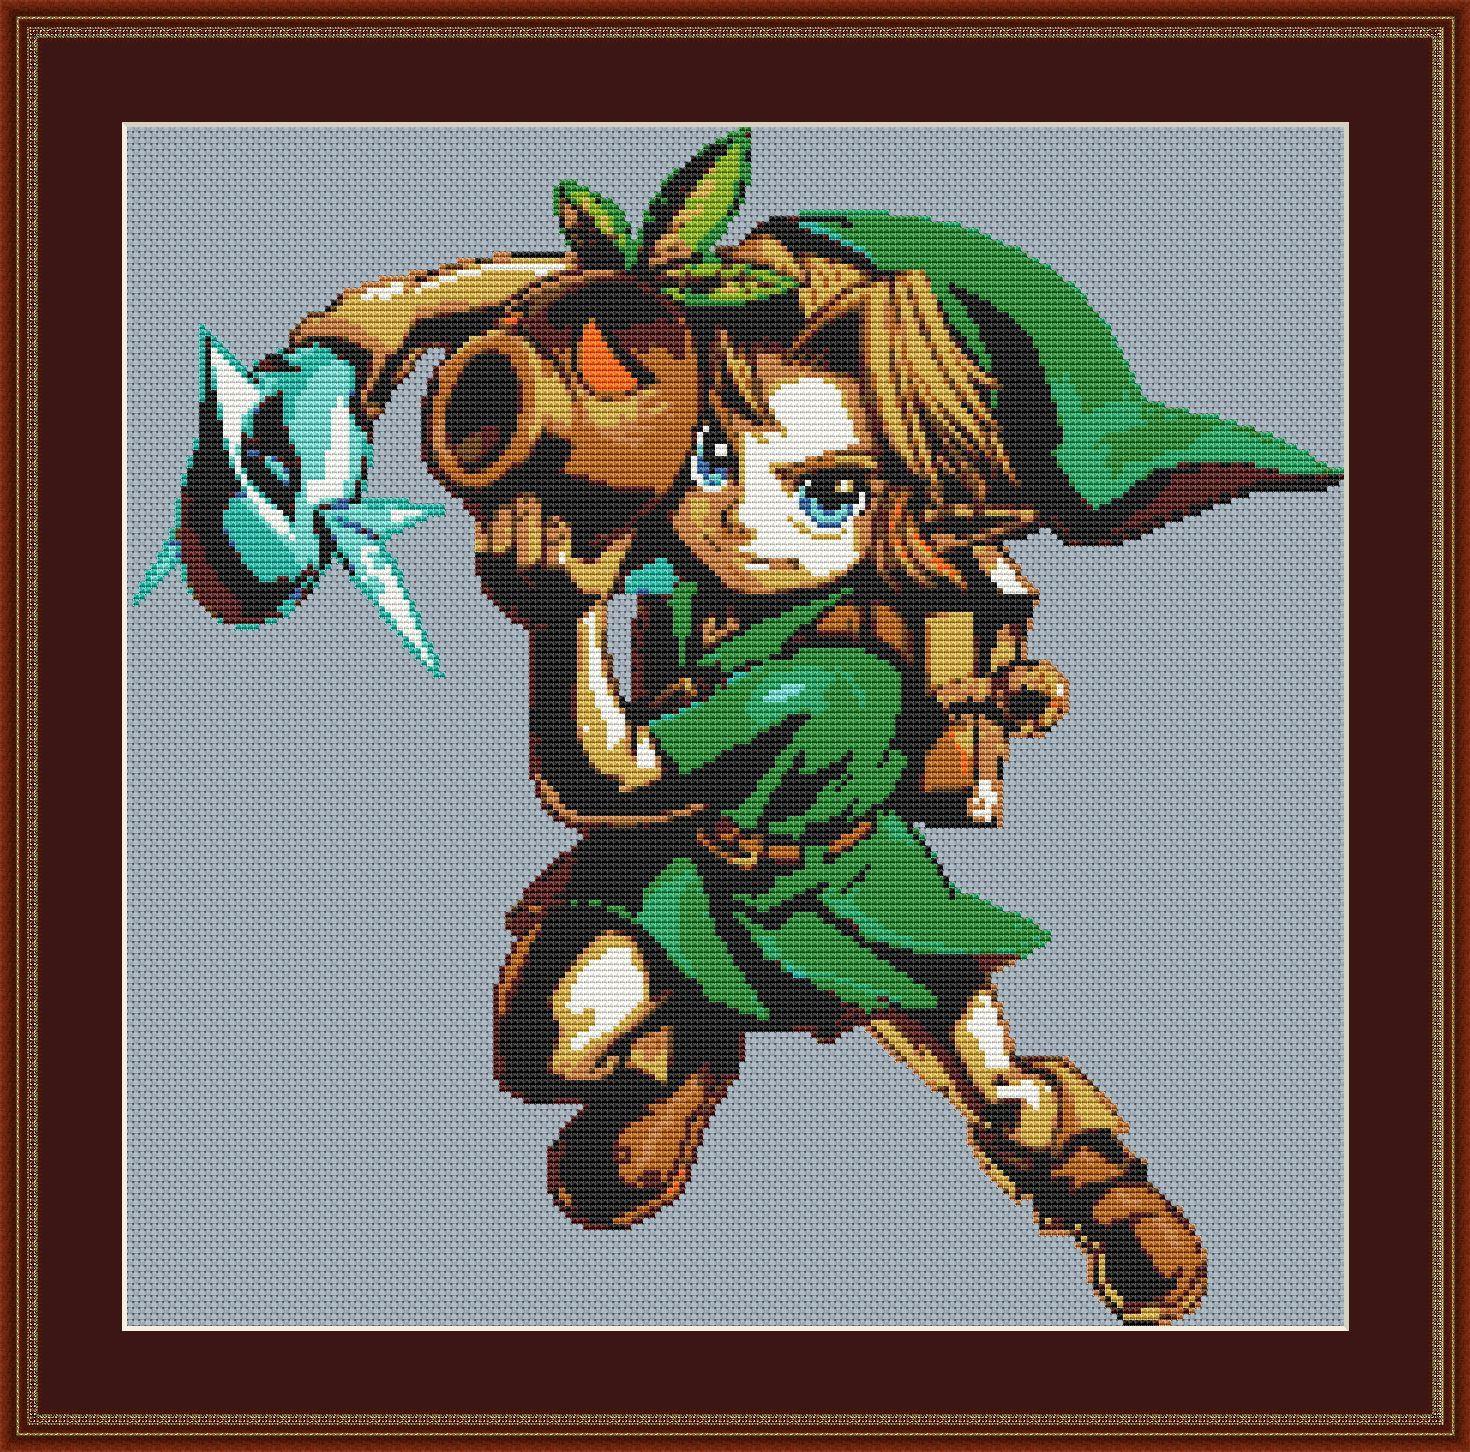 Legend of Zelda Cross Stitch Pattern, Link, Nintendo, Game